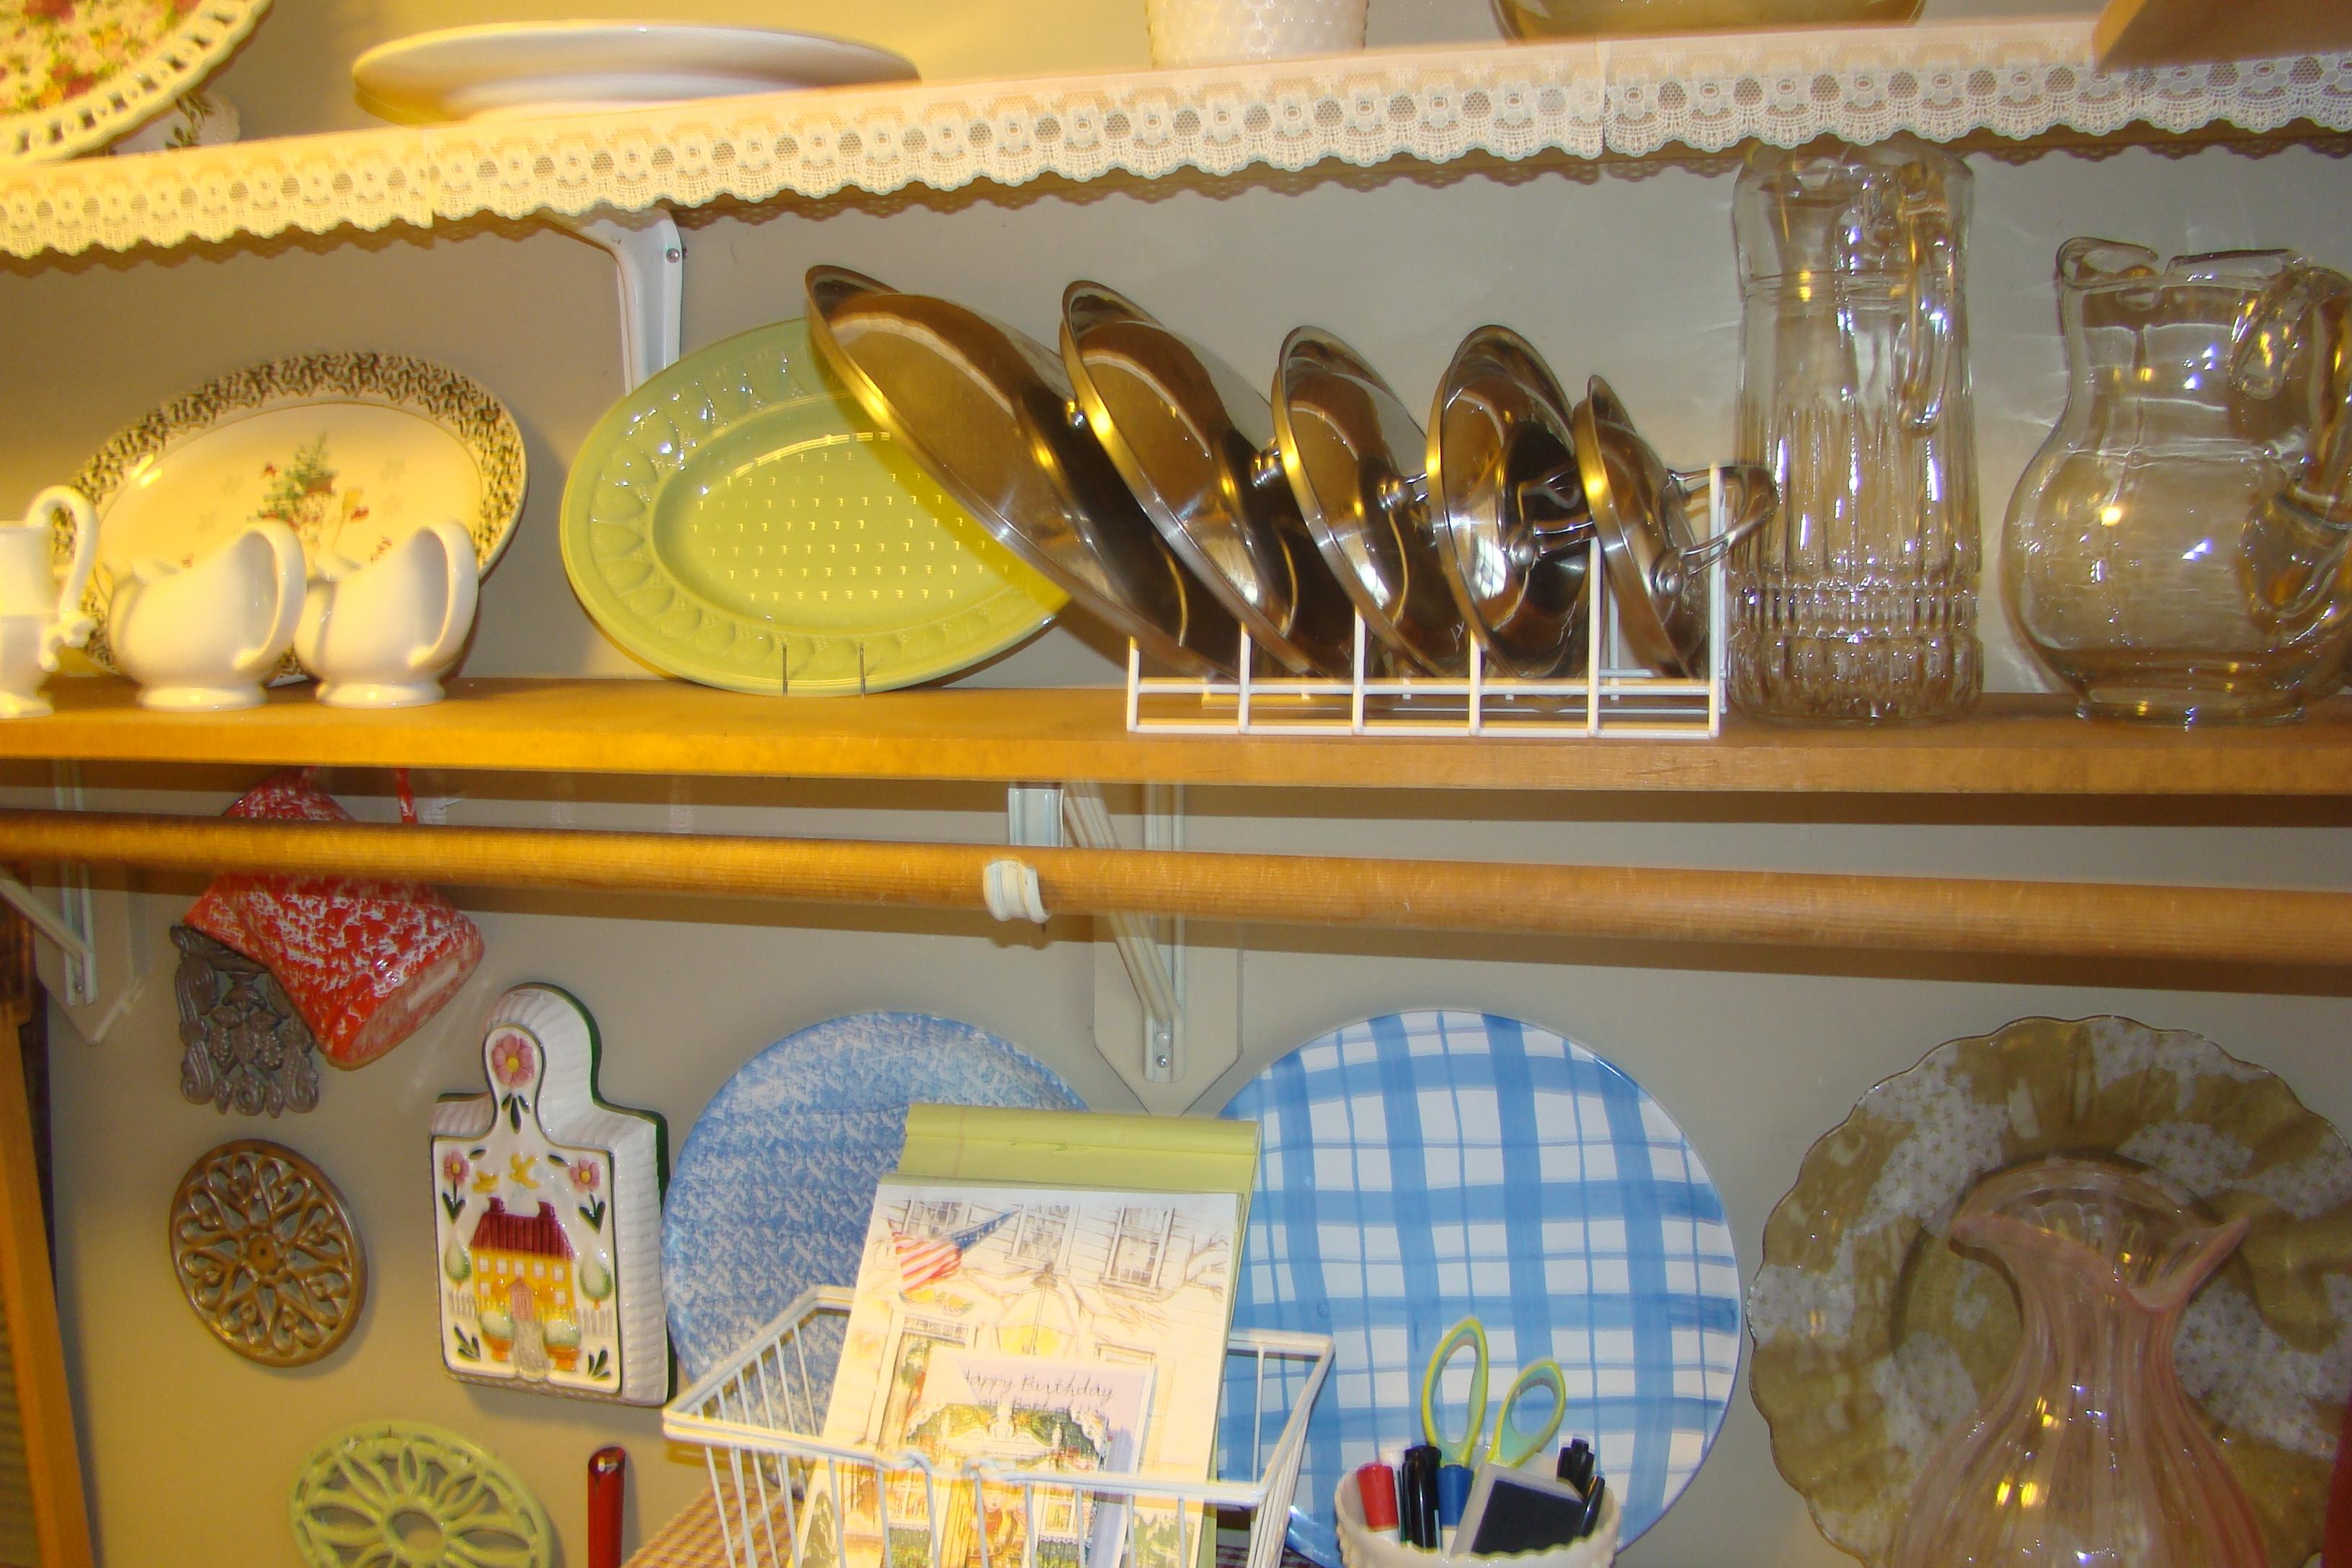 laundry-room-020